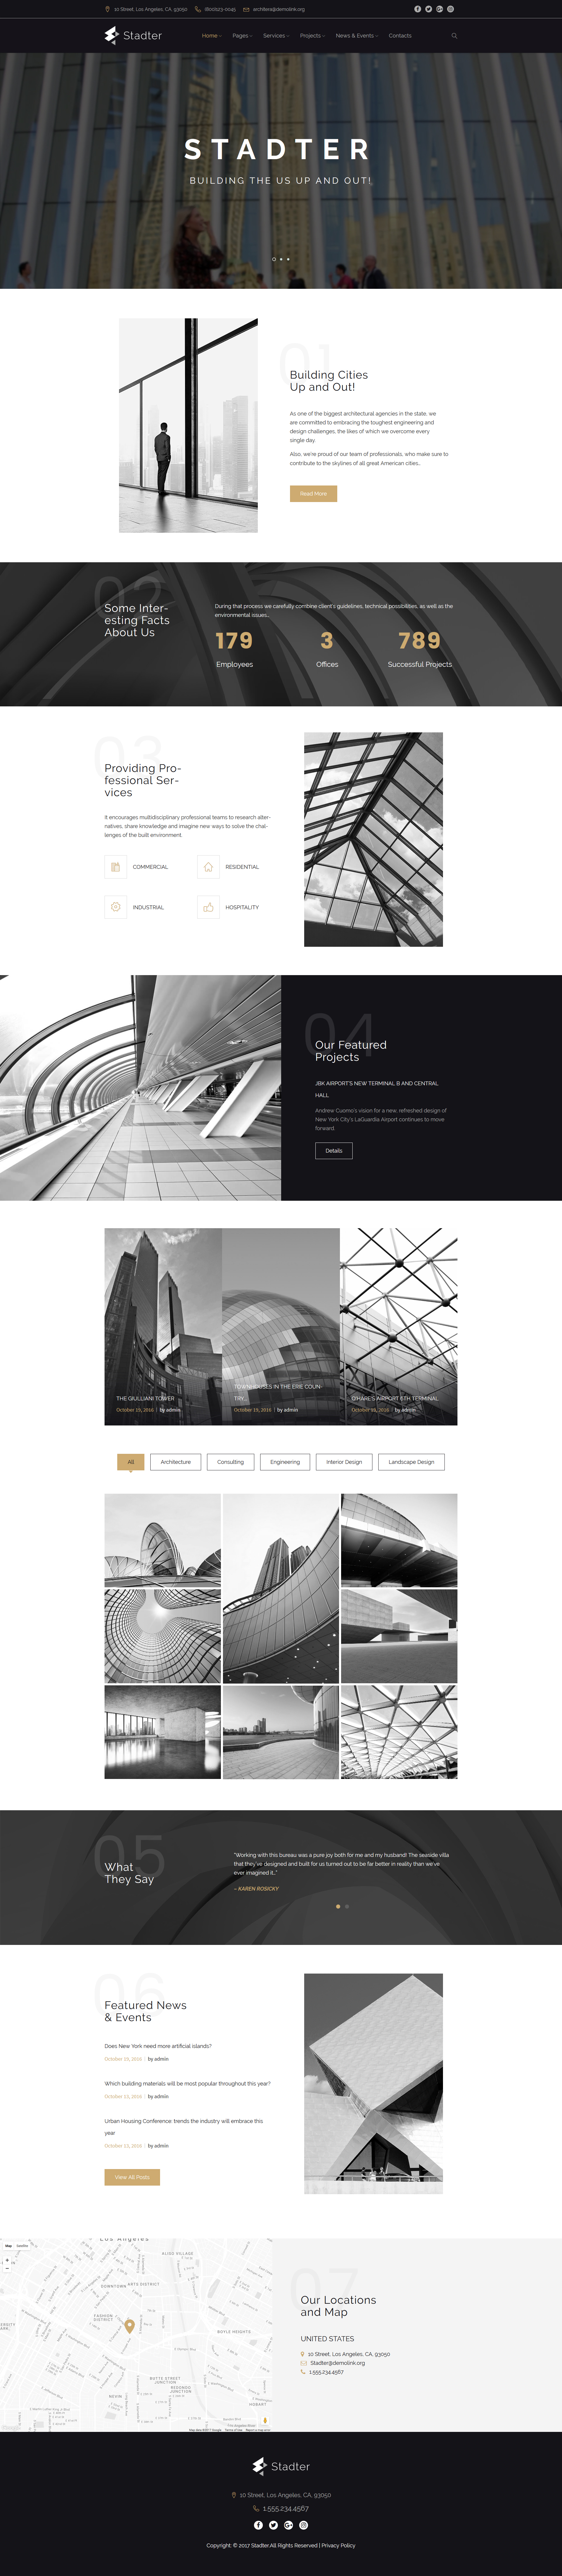 Responsive Stadter - Construction Company Wordpress #63956 - Ekran resmi